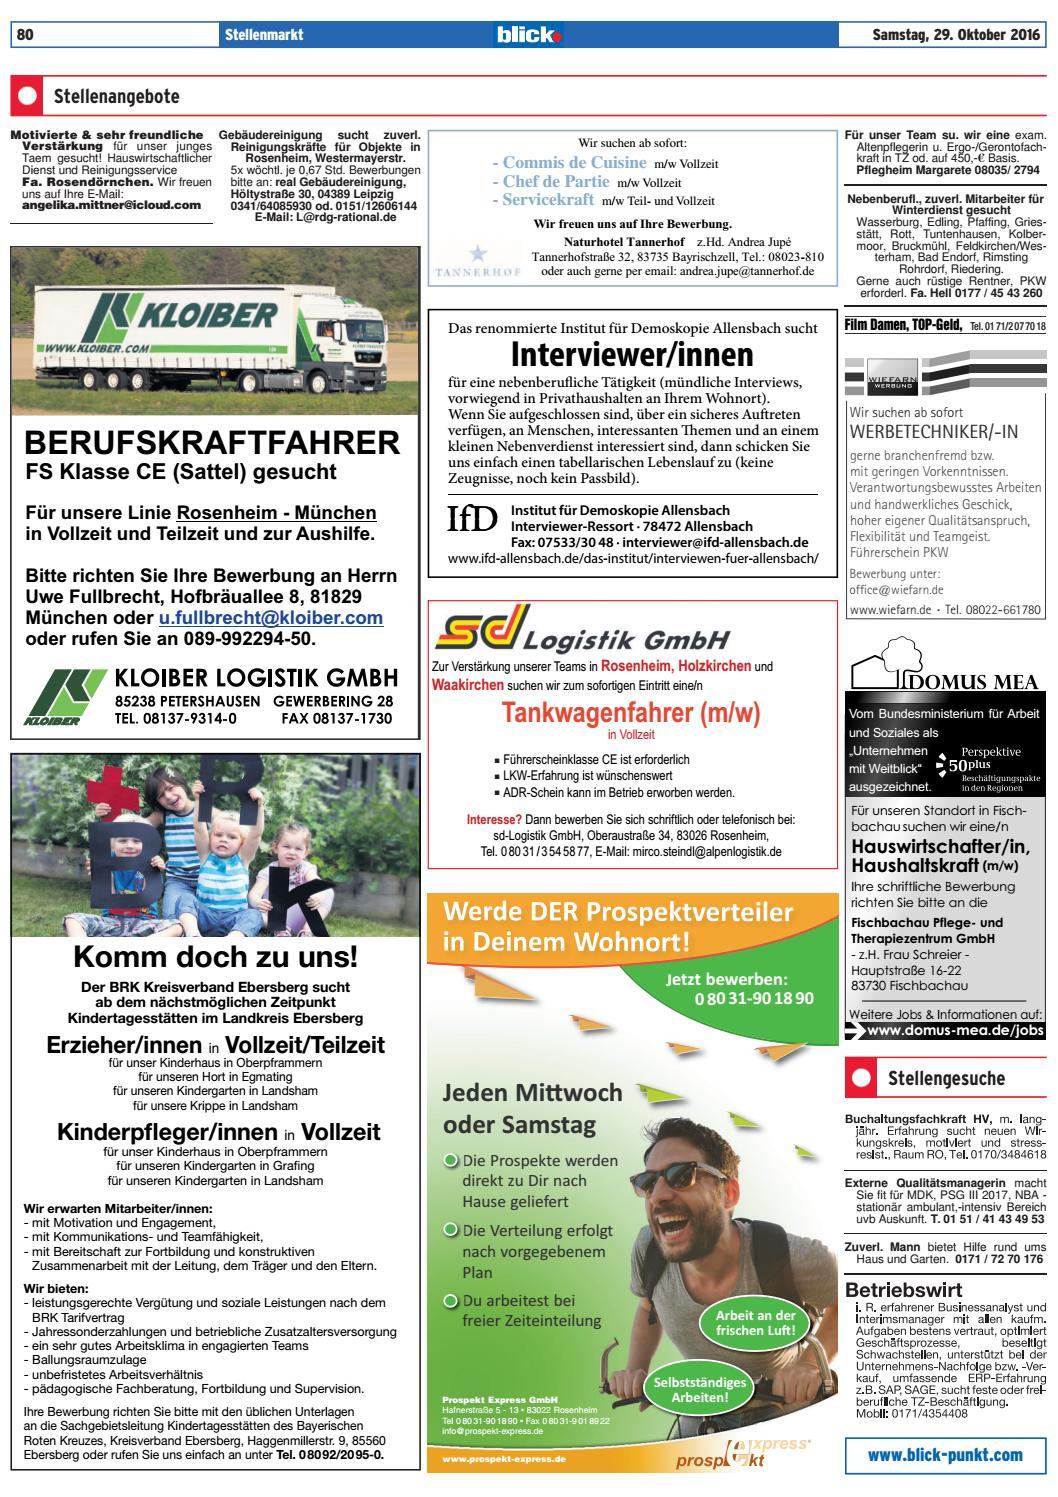 Wasserburger Blick Ausgabe 43